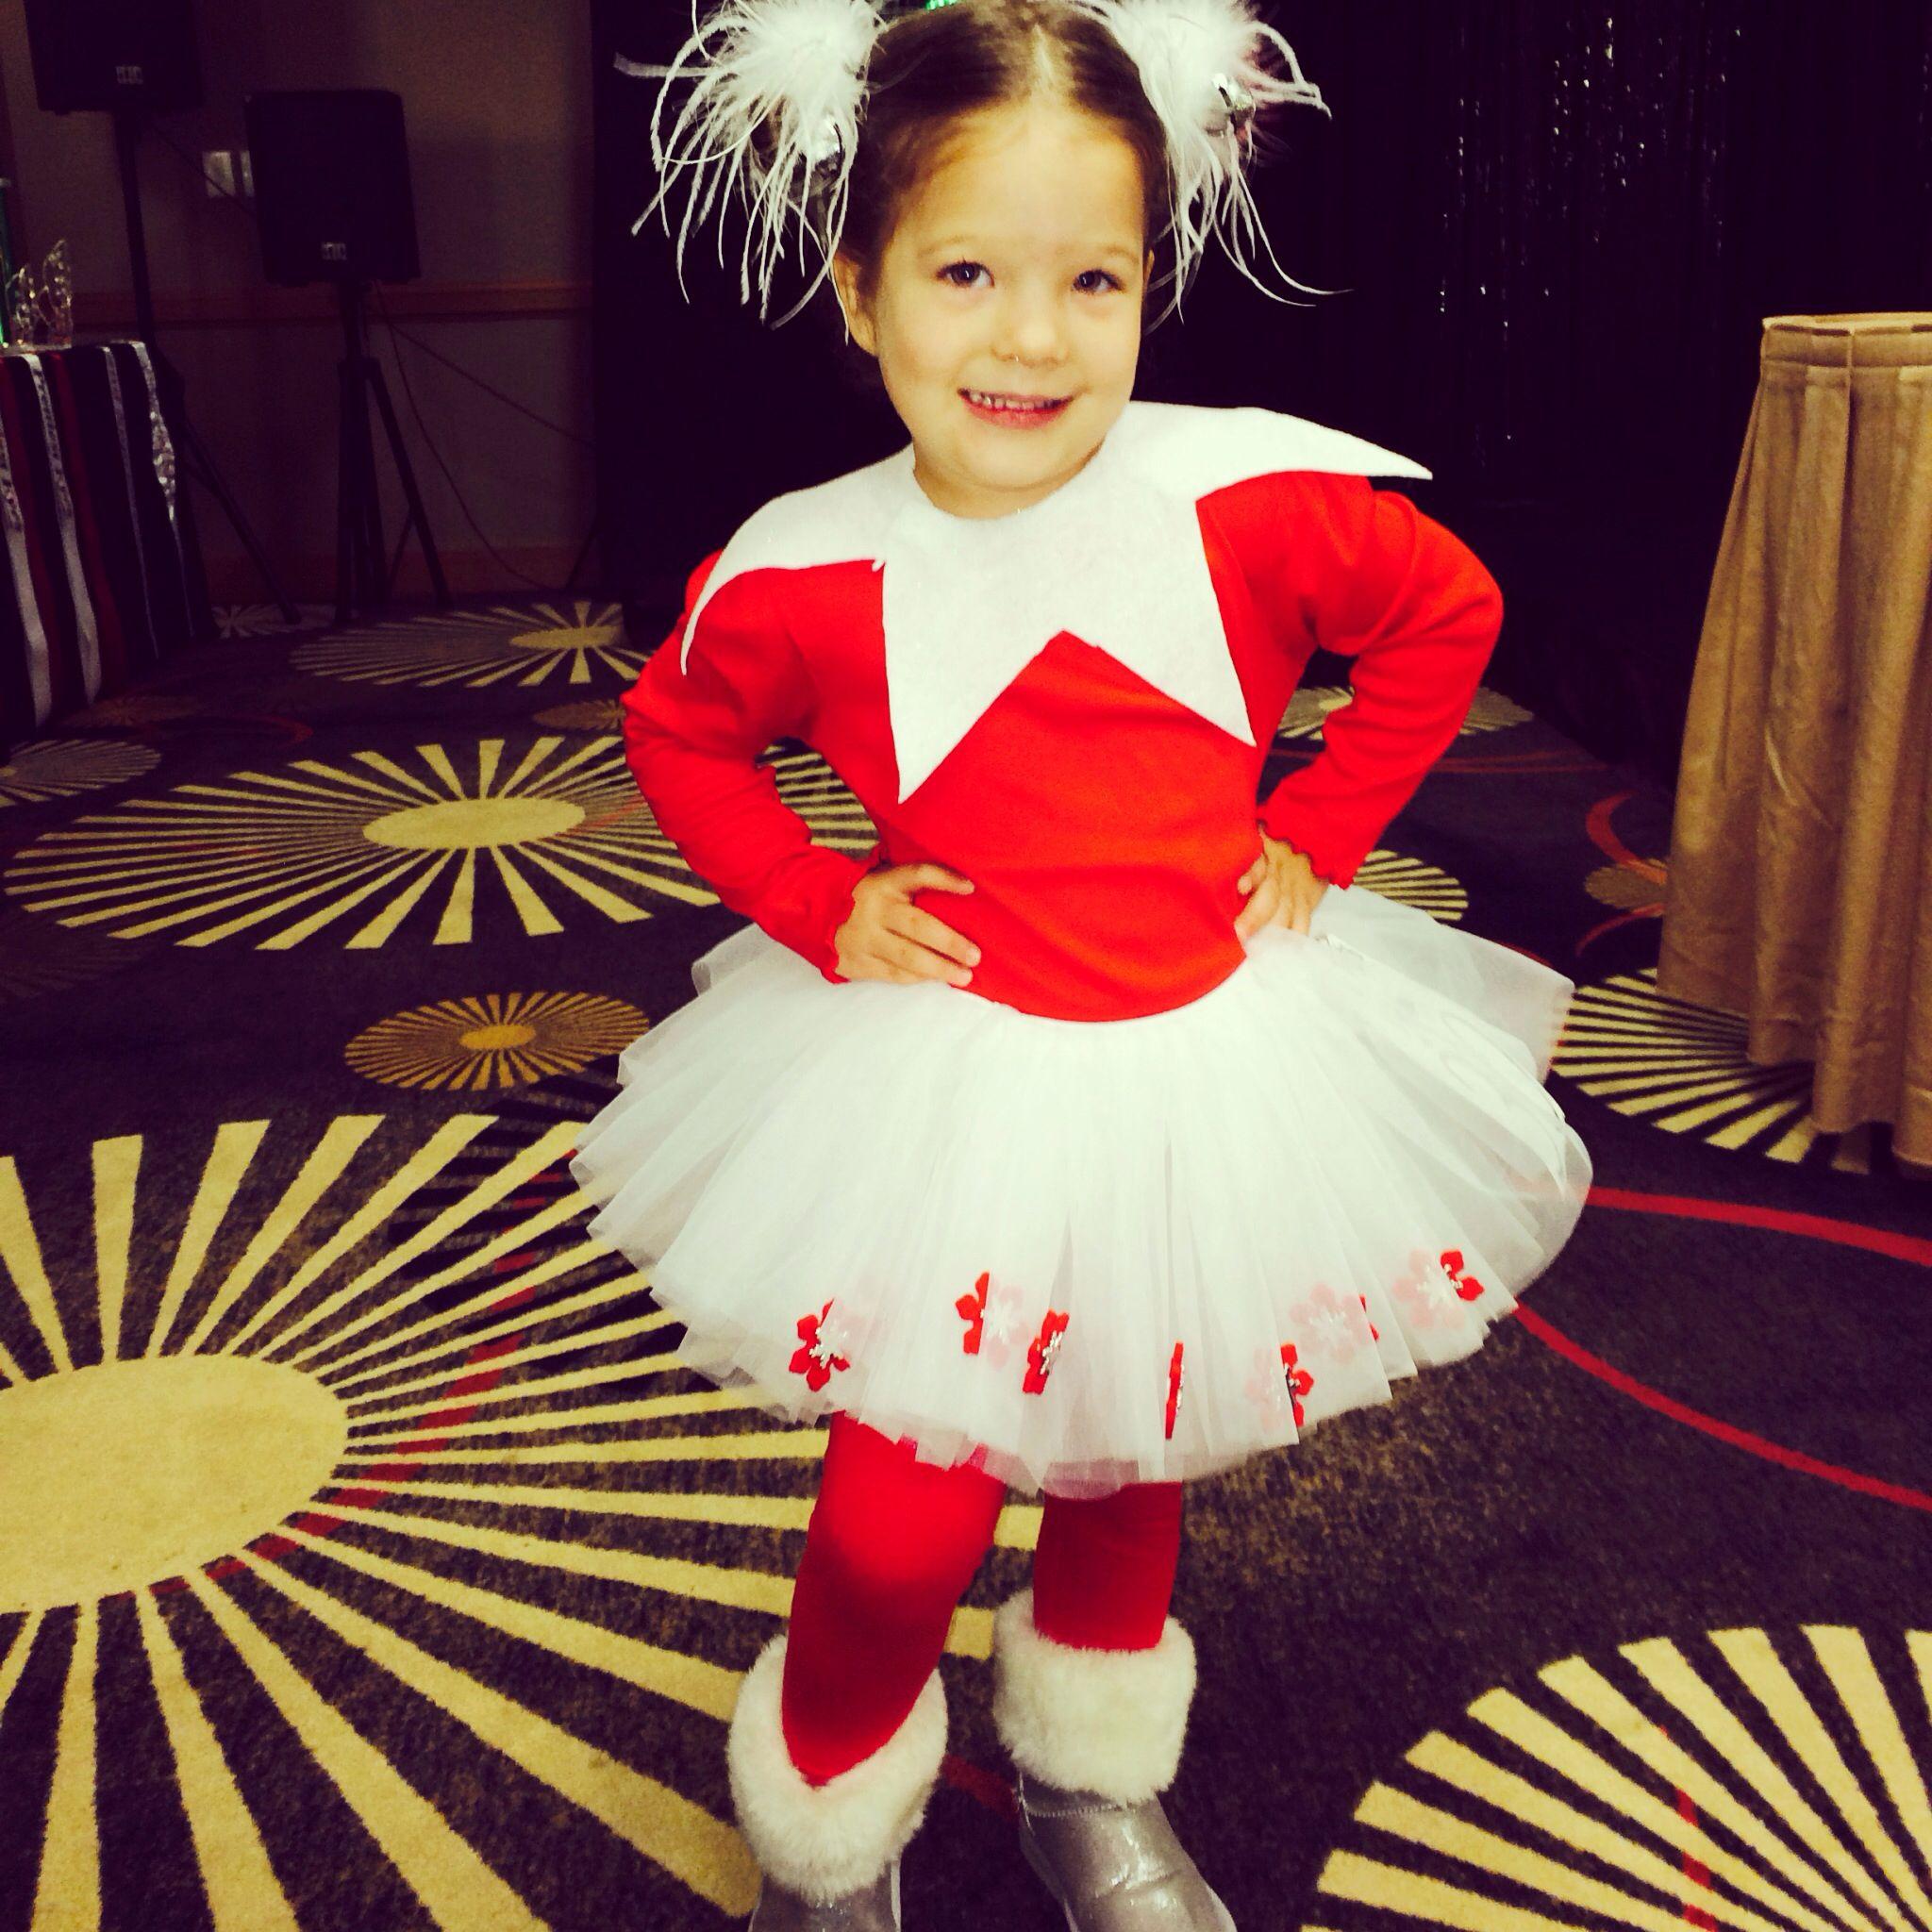 DIY Elf on the Shelf Costume for Halloween